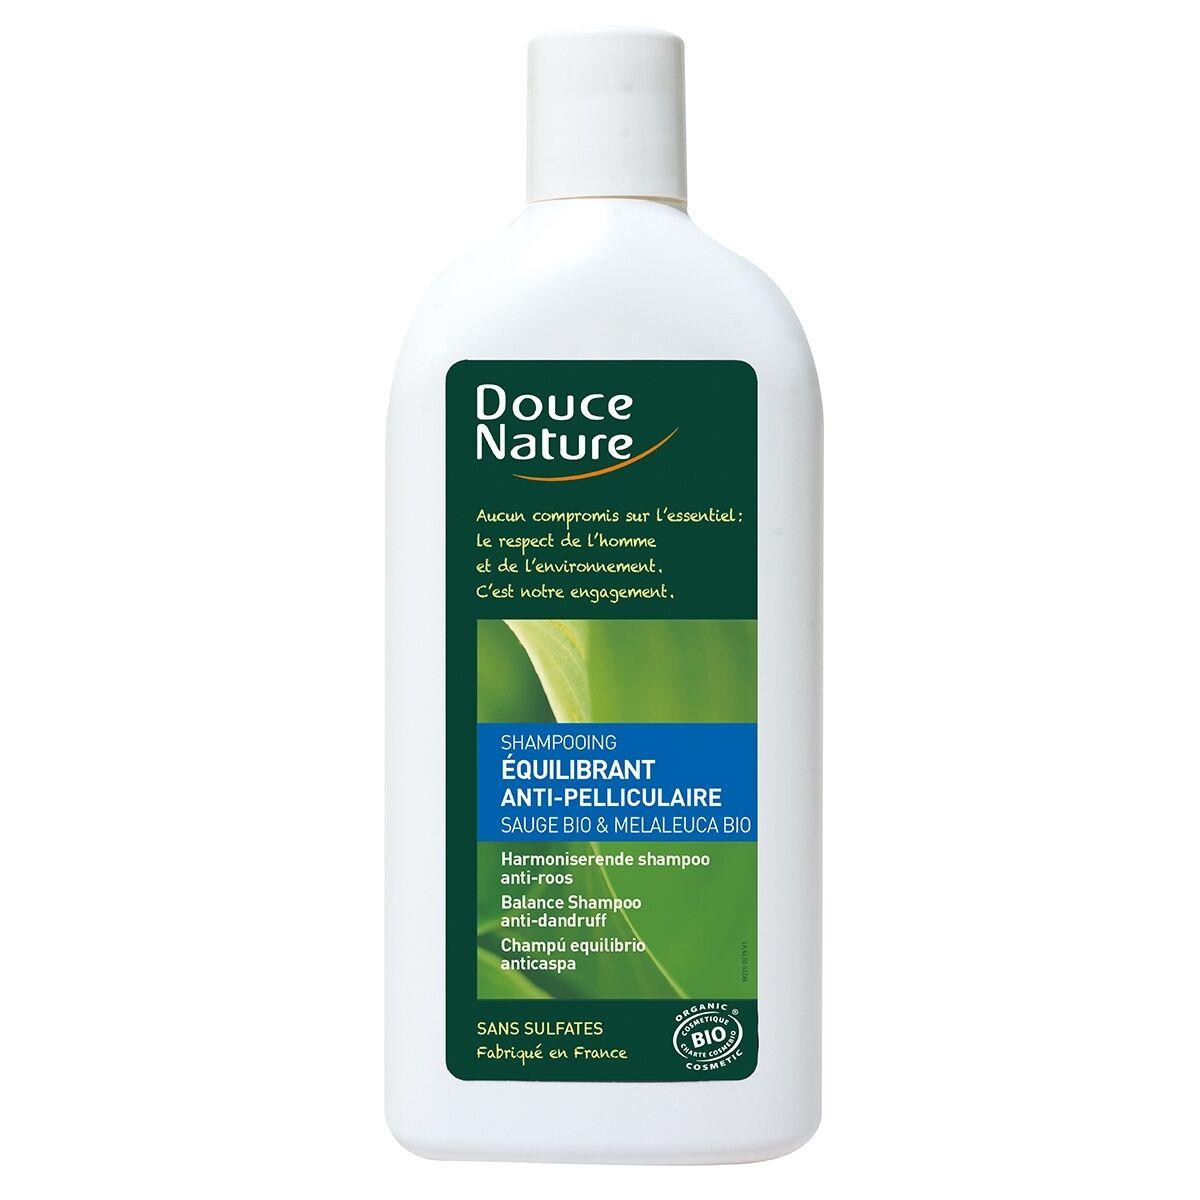 DOUCE NATURE Shampoing équilibrant bio